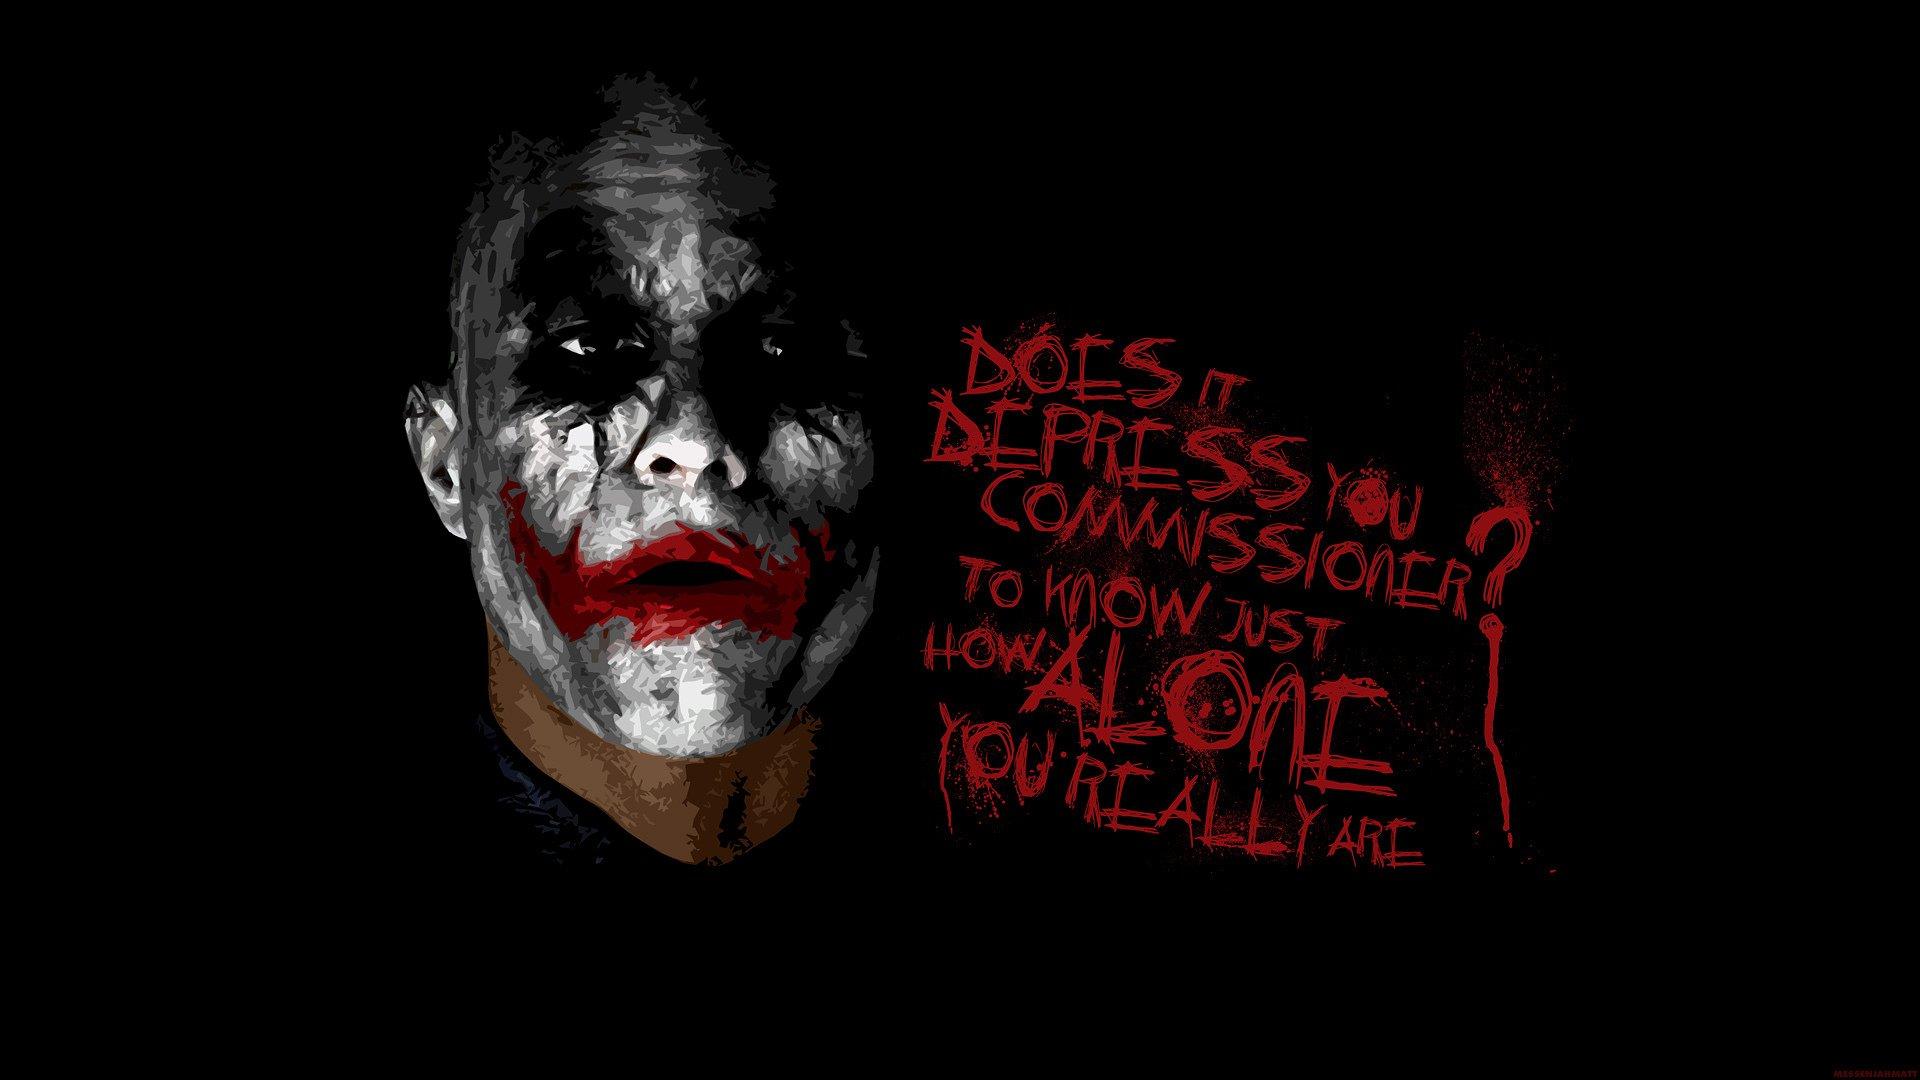 The Dark Knight Hd Wallpaper Background Image 1920x1080 Id 232248 Wallpaper Abyss